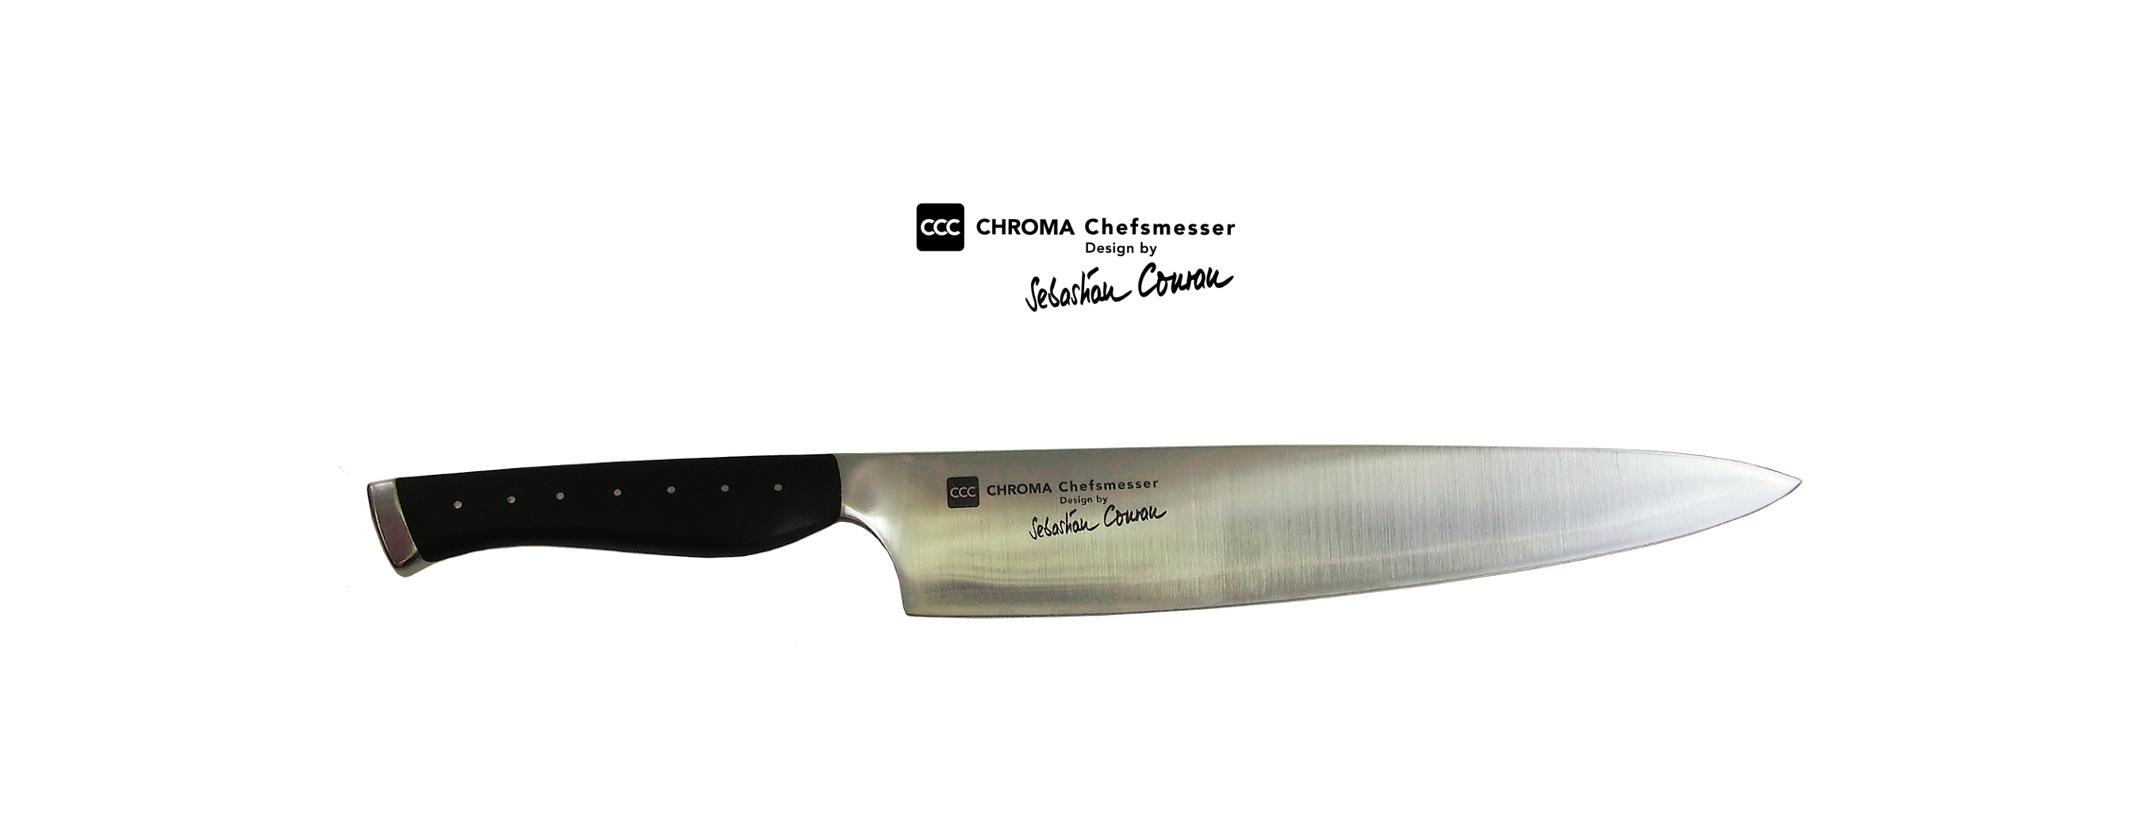 CHROMA CNIFE Chefsmesser